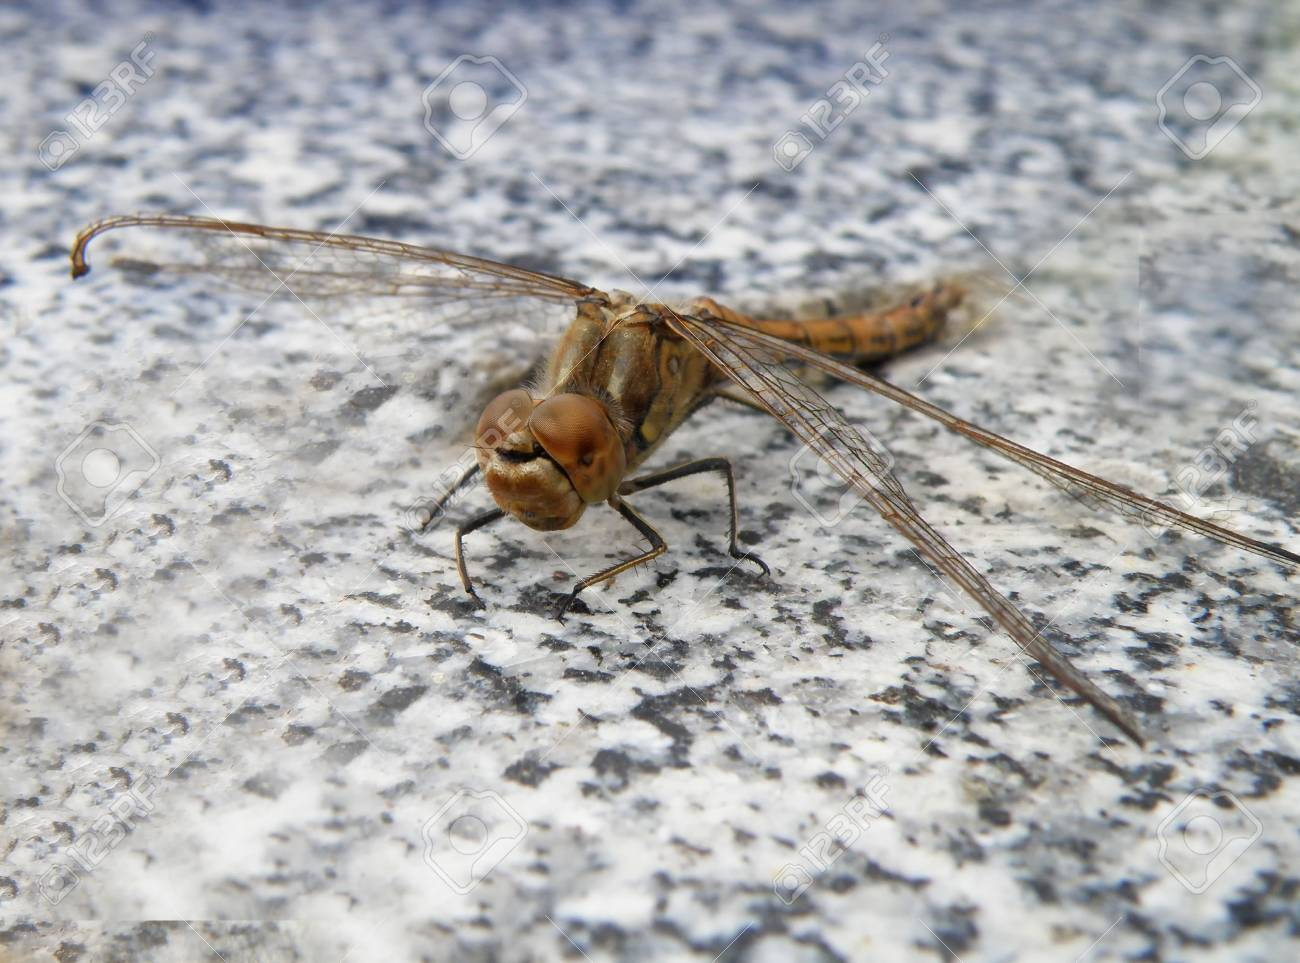 animal life - nice detail of a dragon fly Stock Photo - 5447319